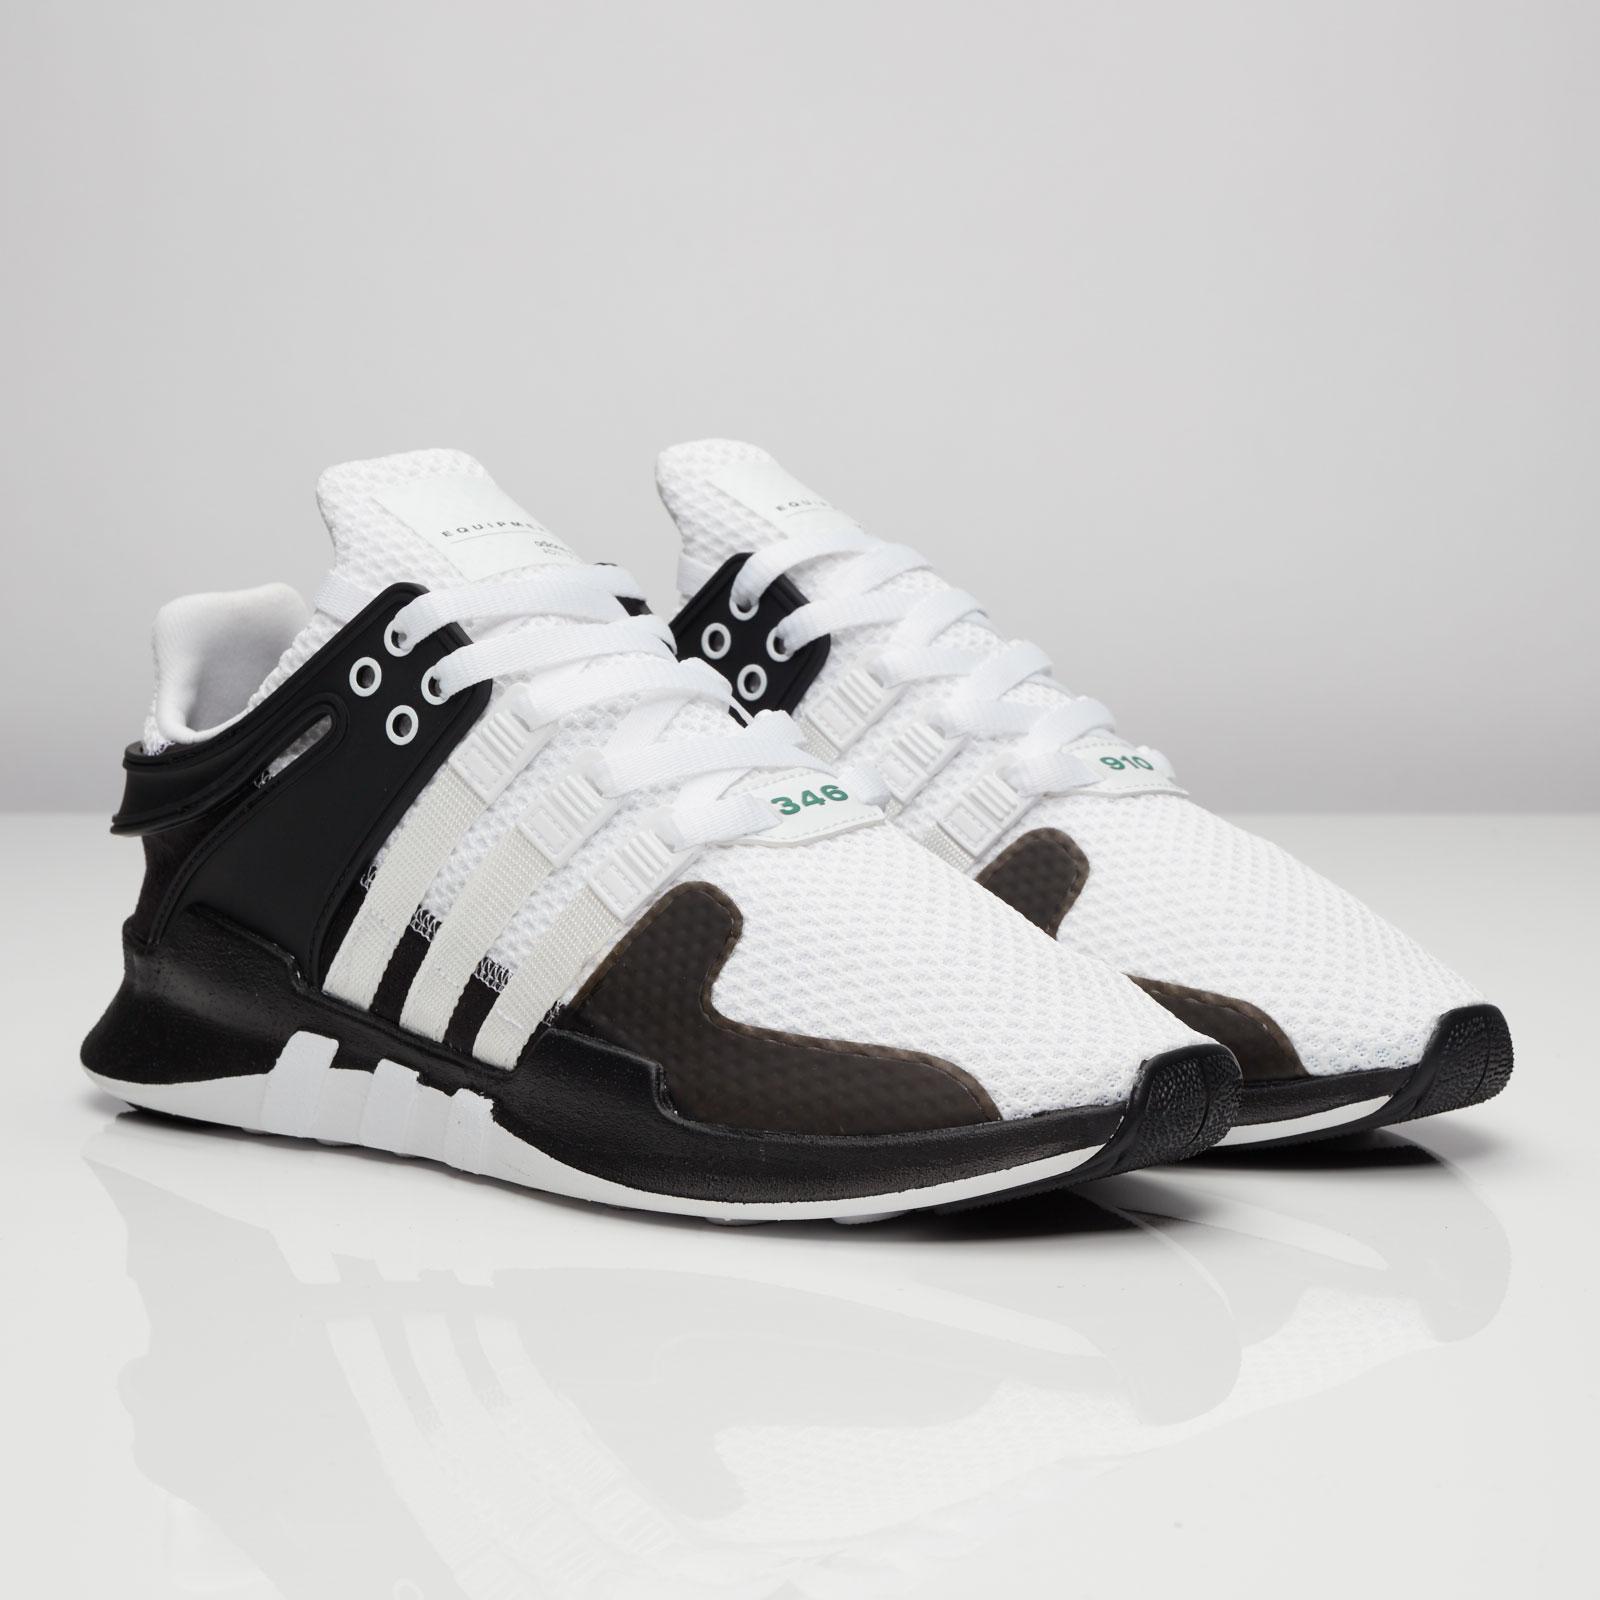 adidas EQT Support ADV 91 16 Bb5919 Sneakersnstuff I